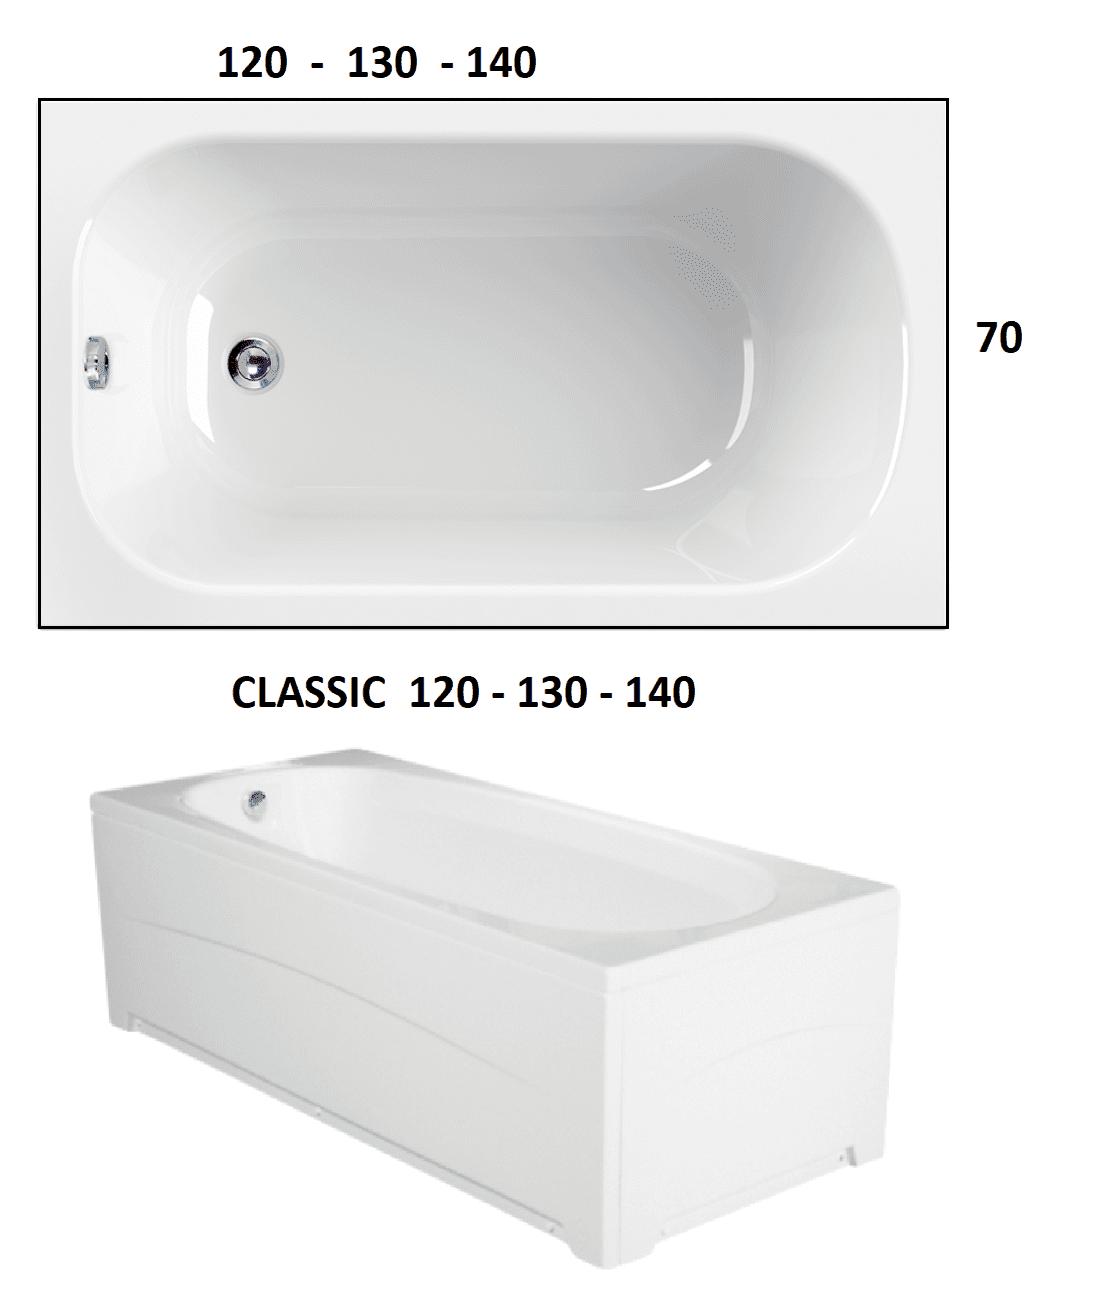 Vasca Da Bagno Angolare 120.Classic 120 130 140 X 70 Vasca Da Bagno Rettangolare